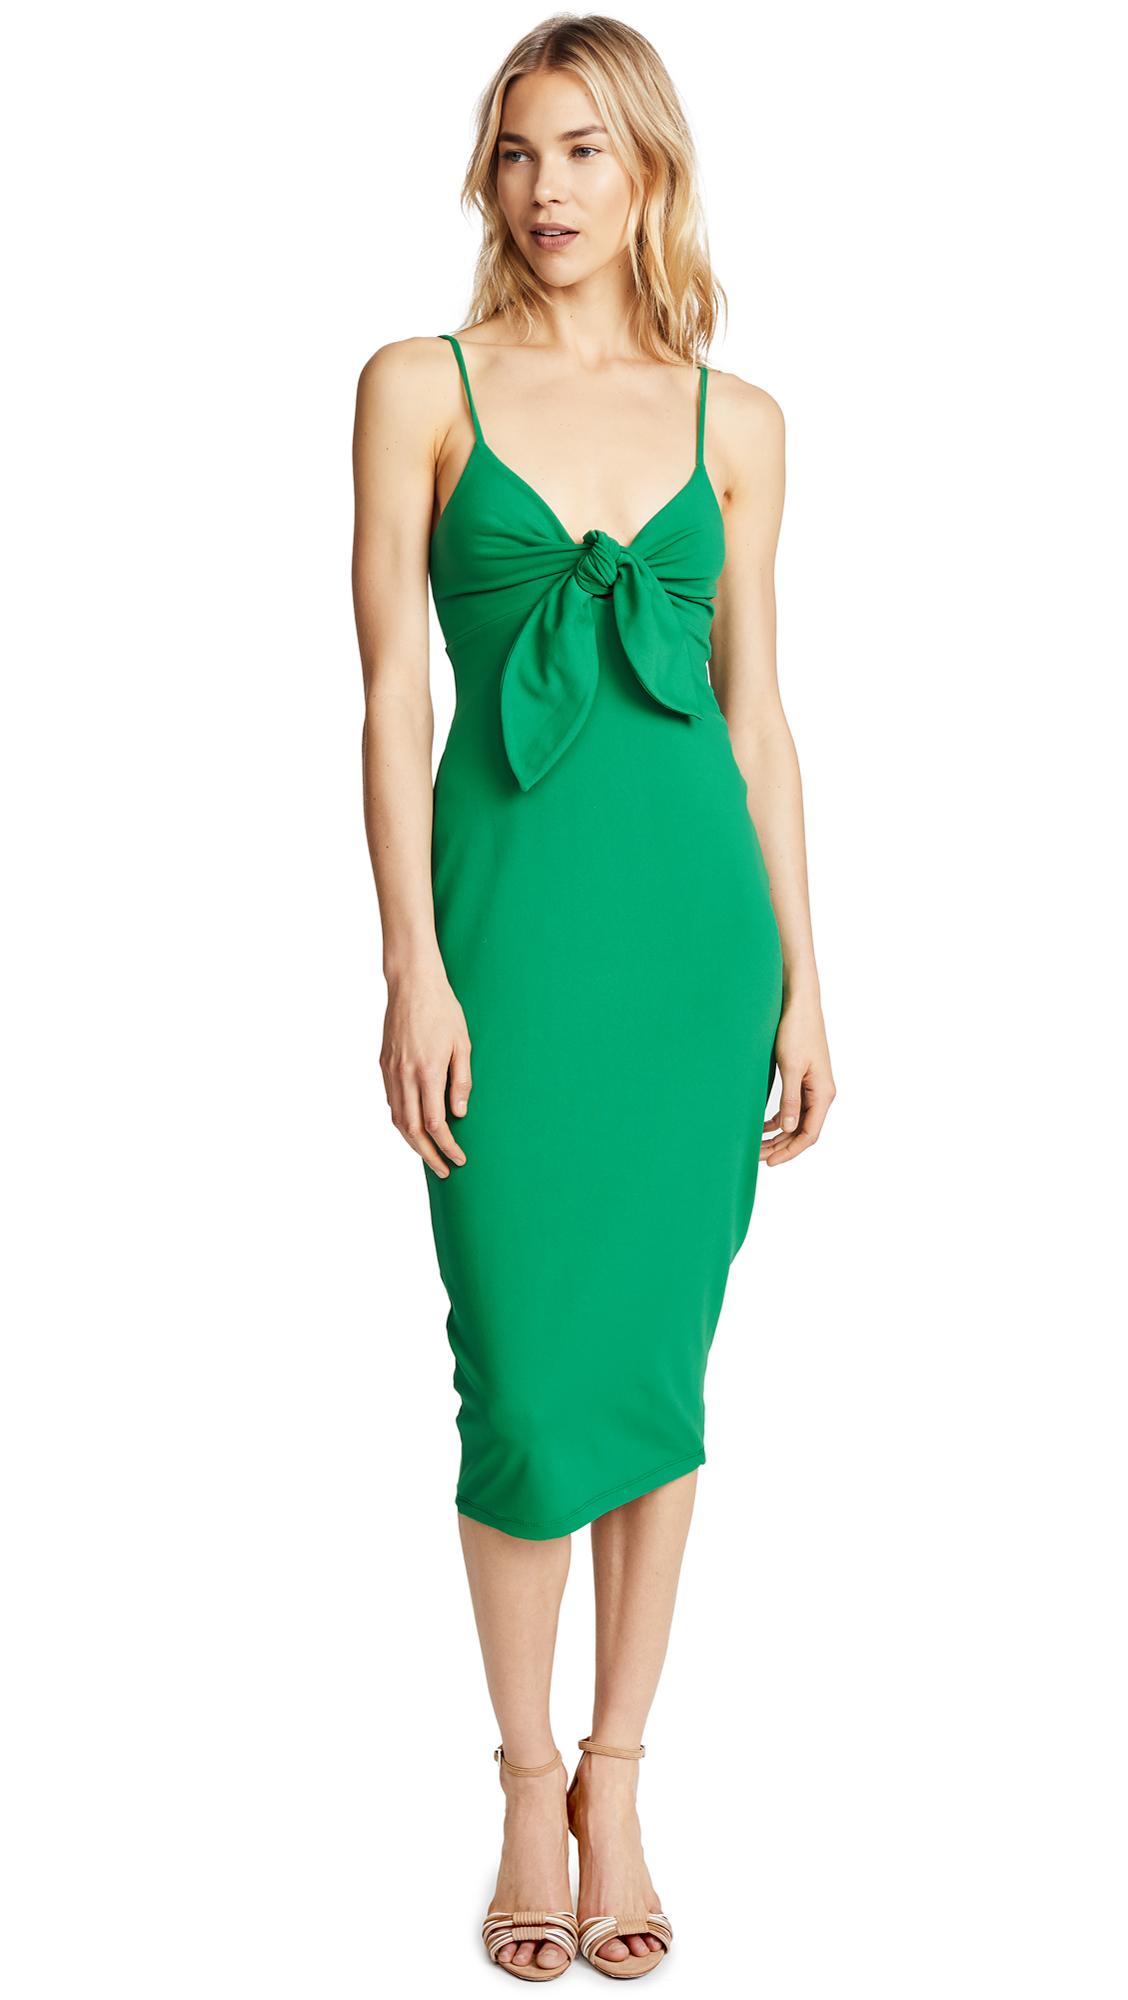 Susana Monaco Isadora Bow Detail Midi Dress